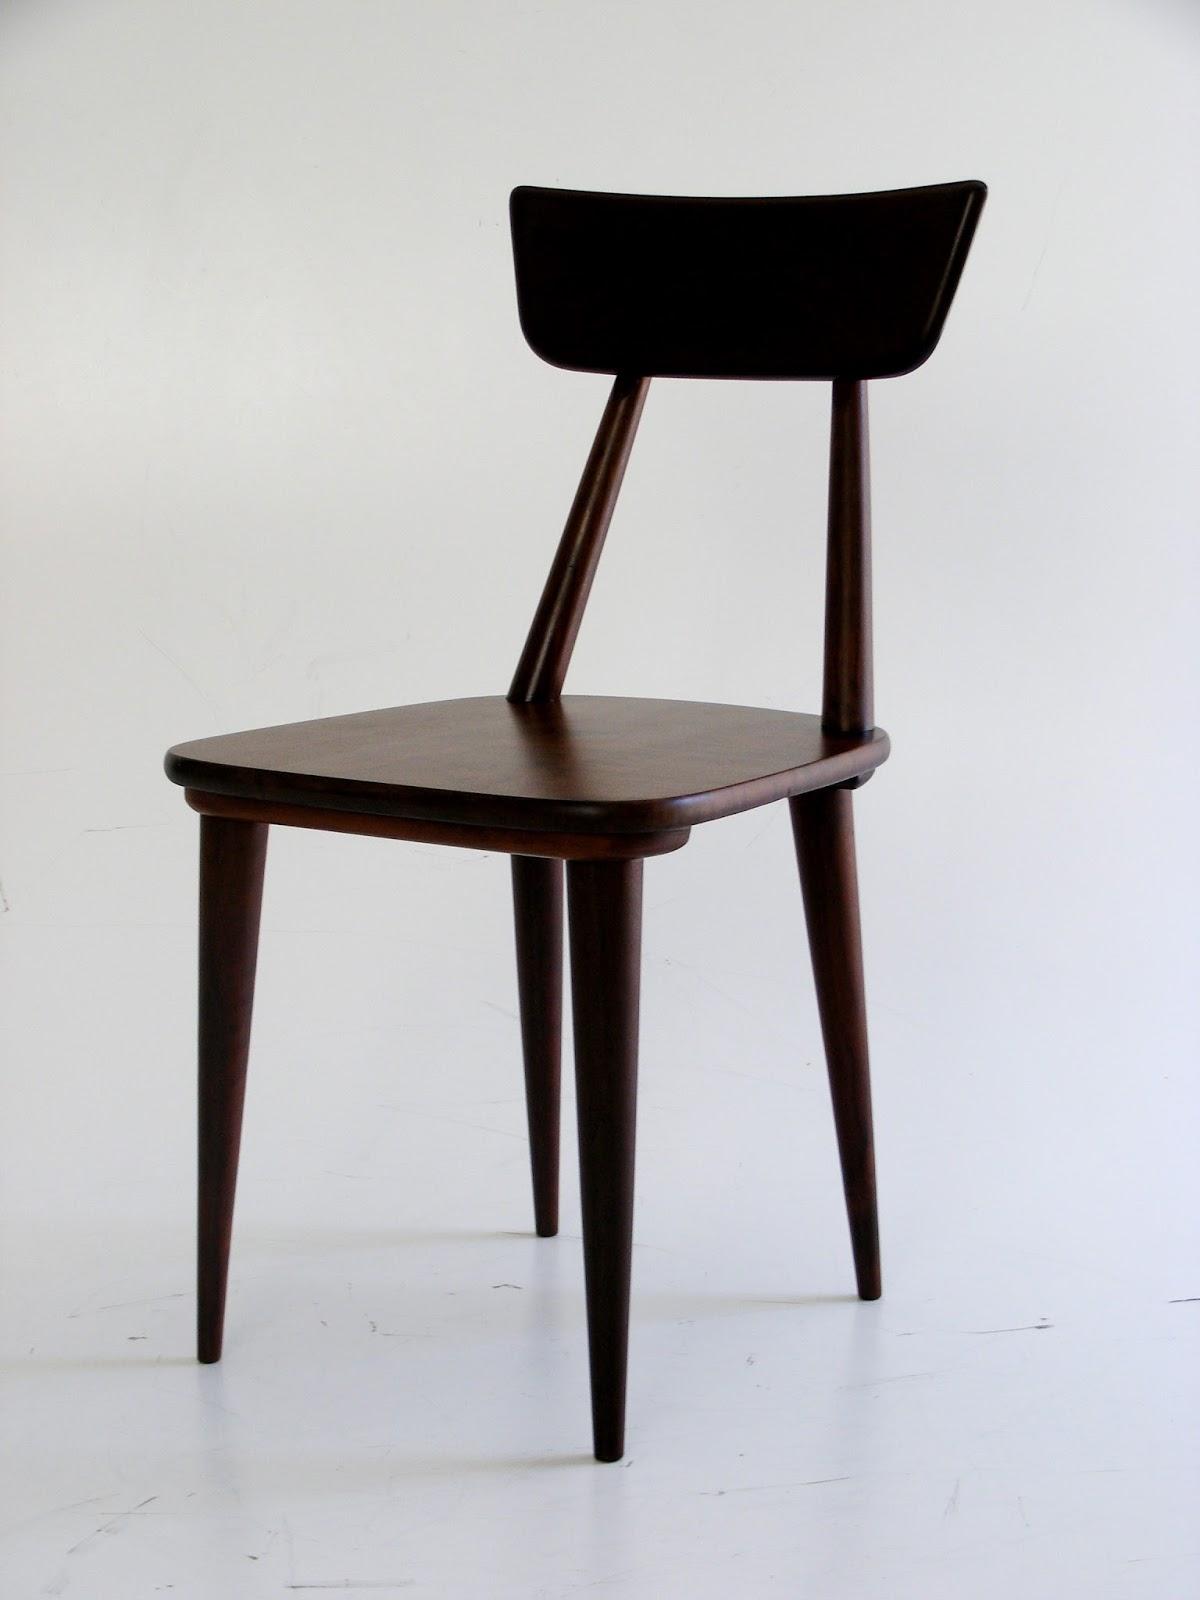 VAMP FURNITURE This weeks new vintage furniture stock at  : PIC2B1CVAMP82BMEYER2BCHAIRS16102015 from vampfurniture.blogspot.com size 1200 x 1600 jpeg 98kB